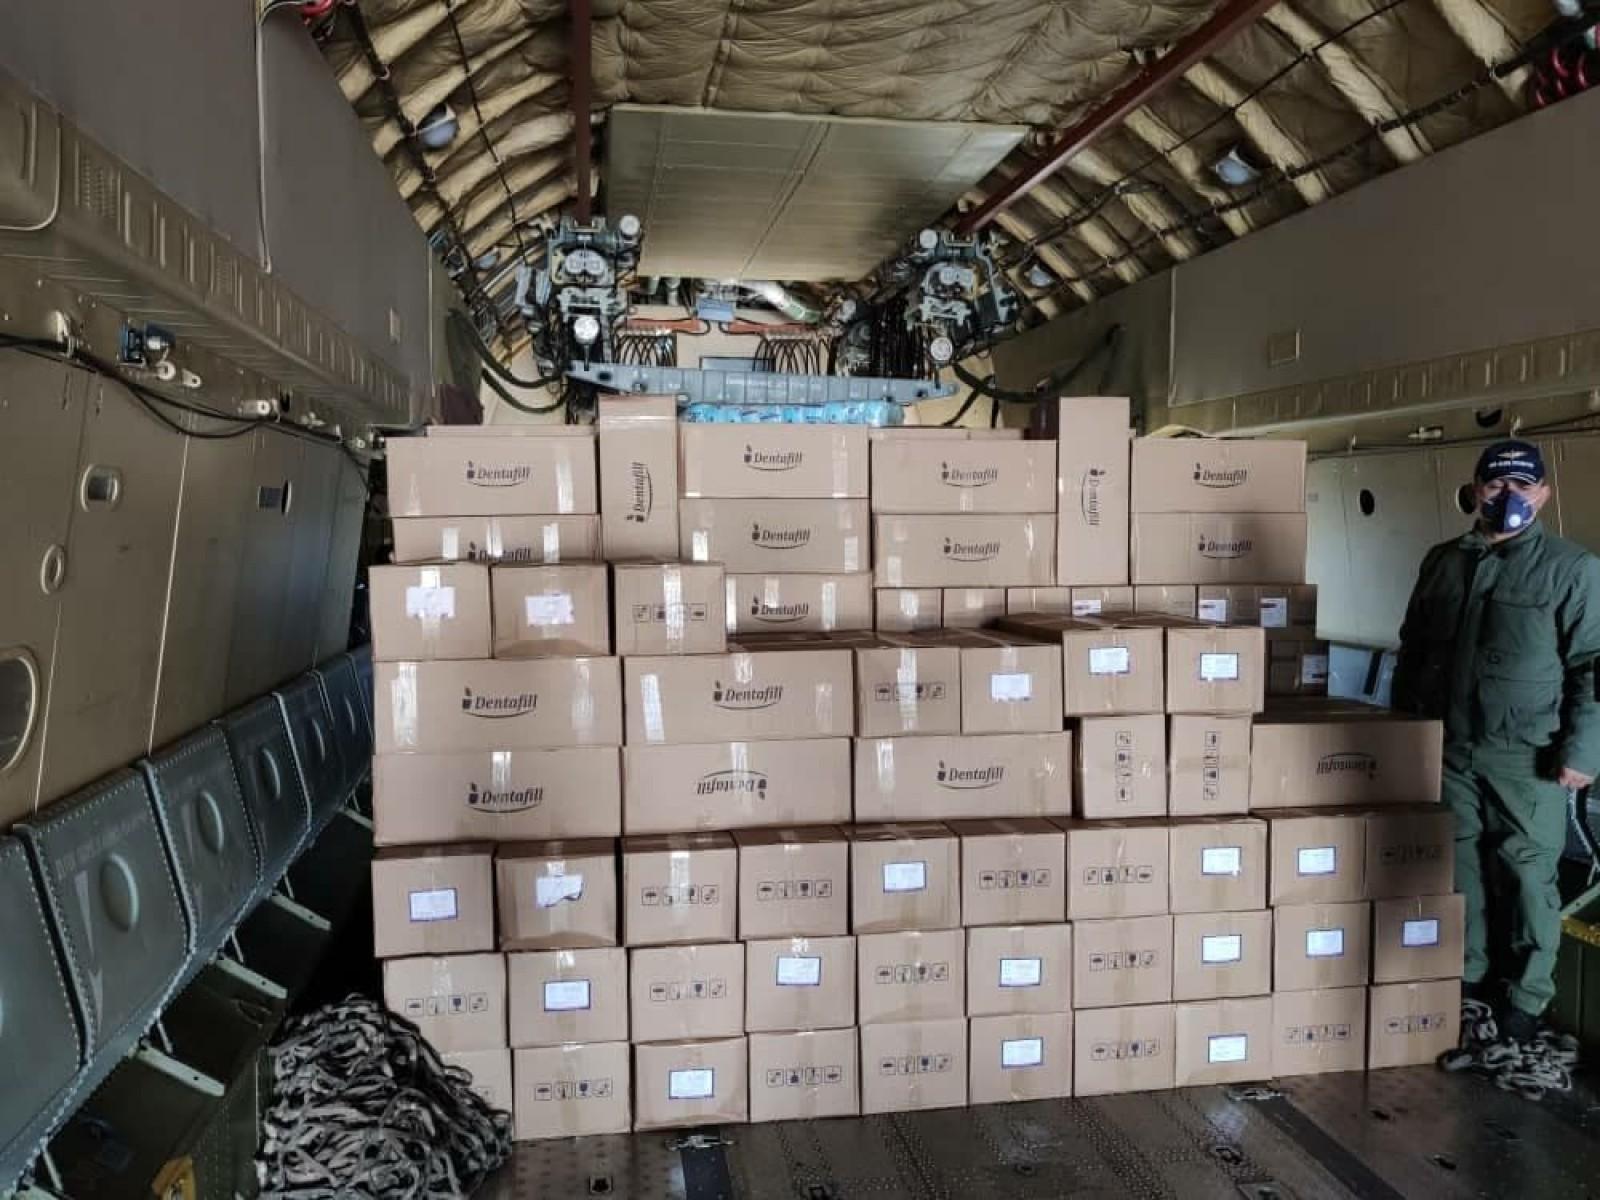 Кыргызстану передали гуманитарный груз из Узбекистана